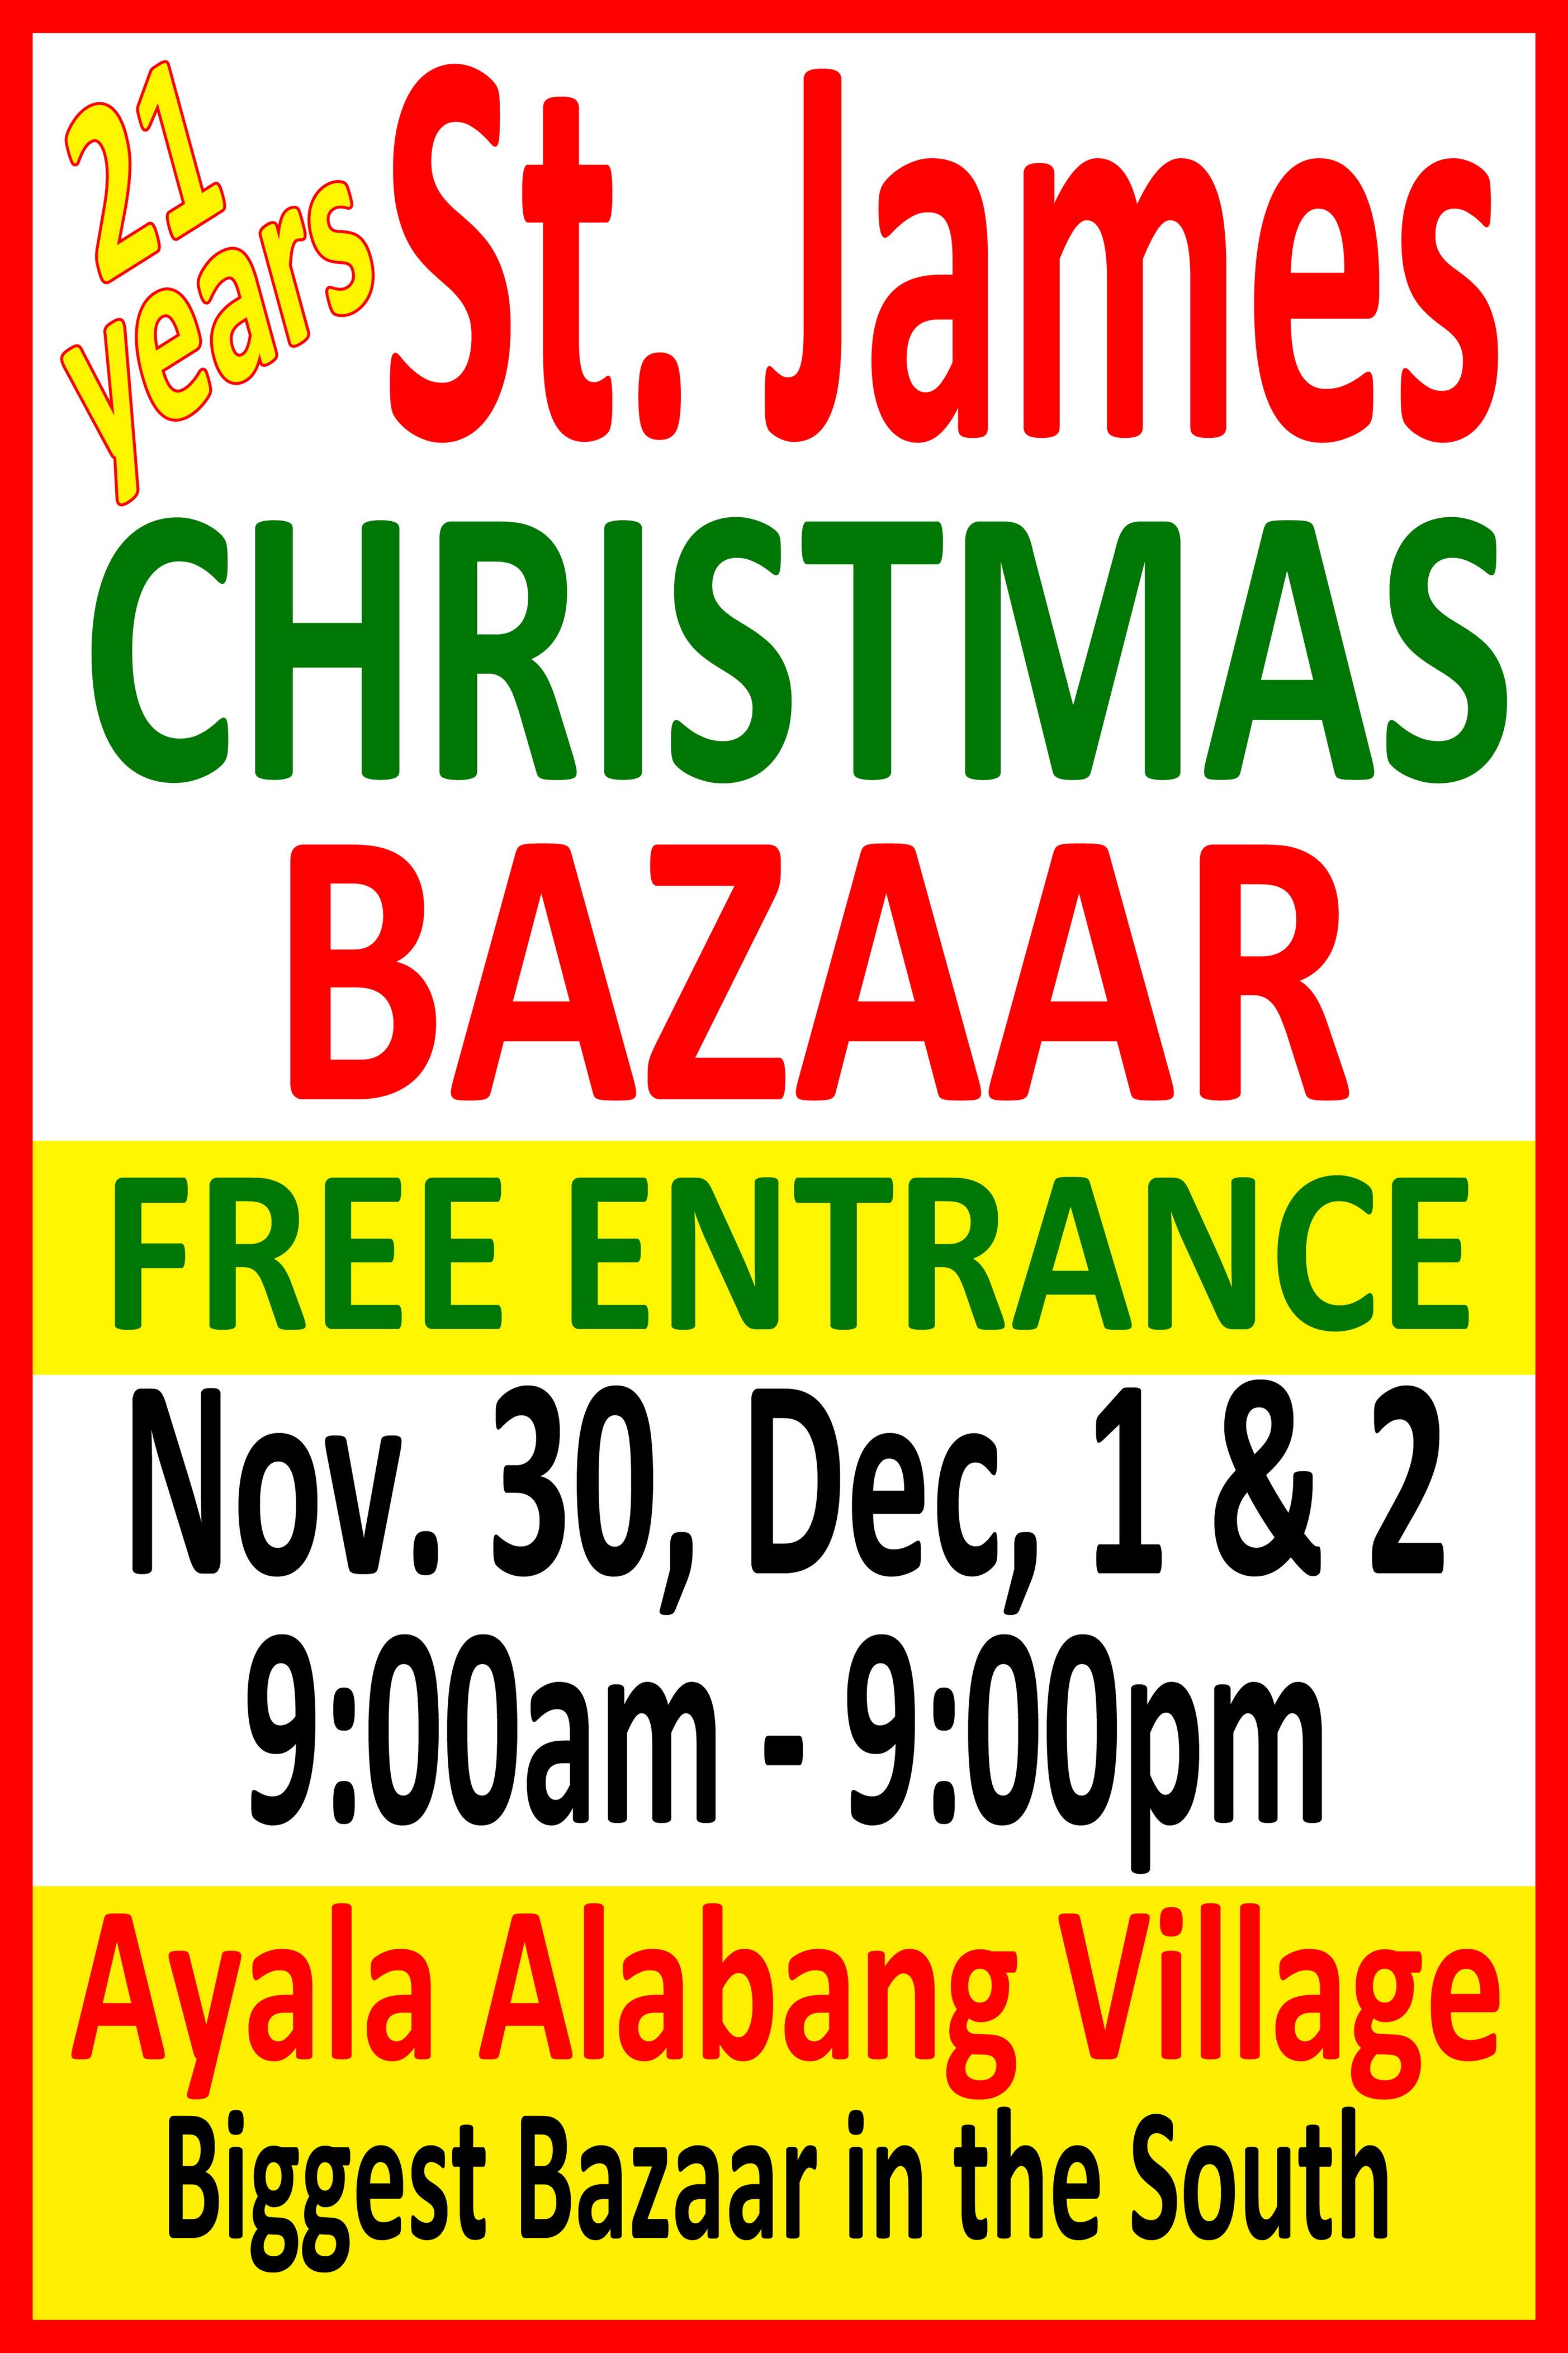 St. James Christmas Bazaar November 2012